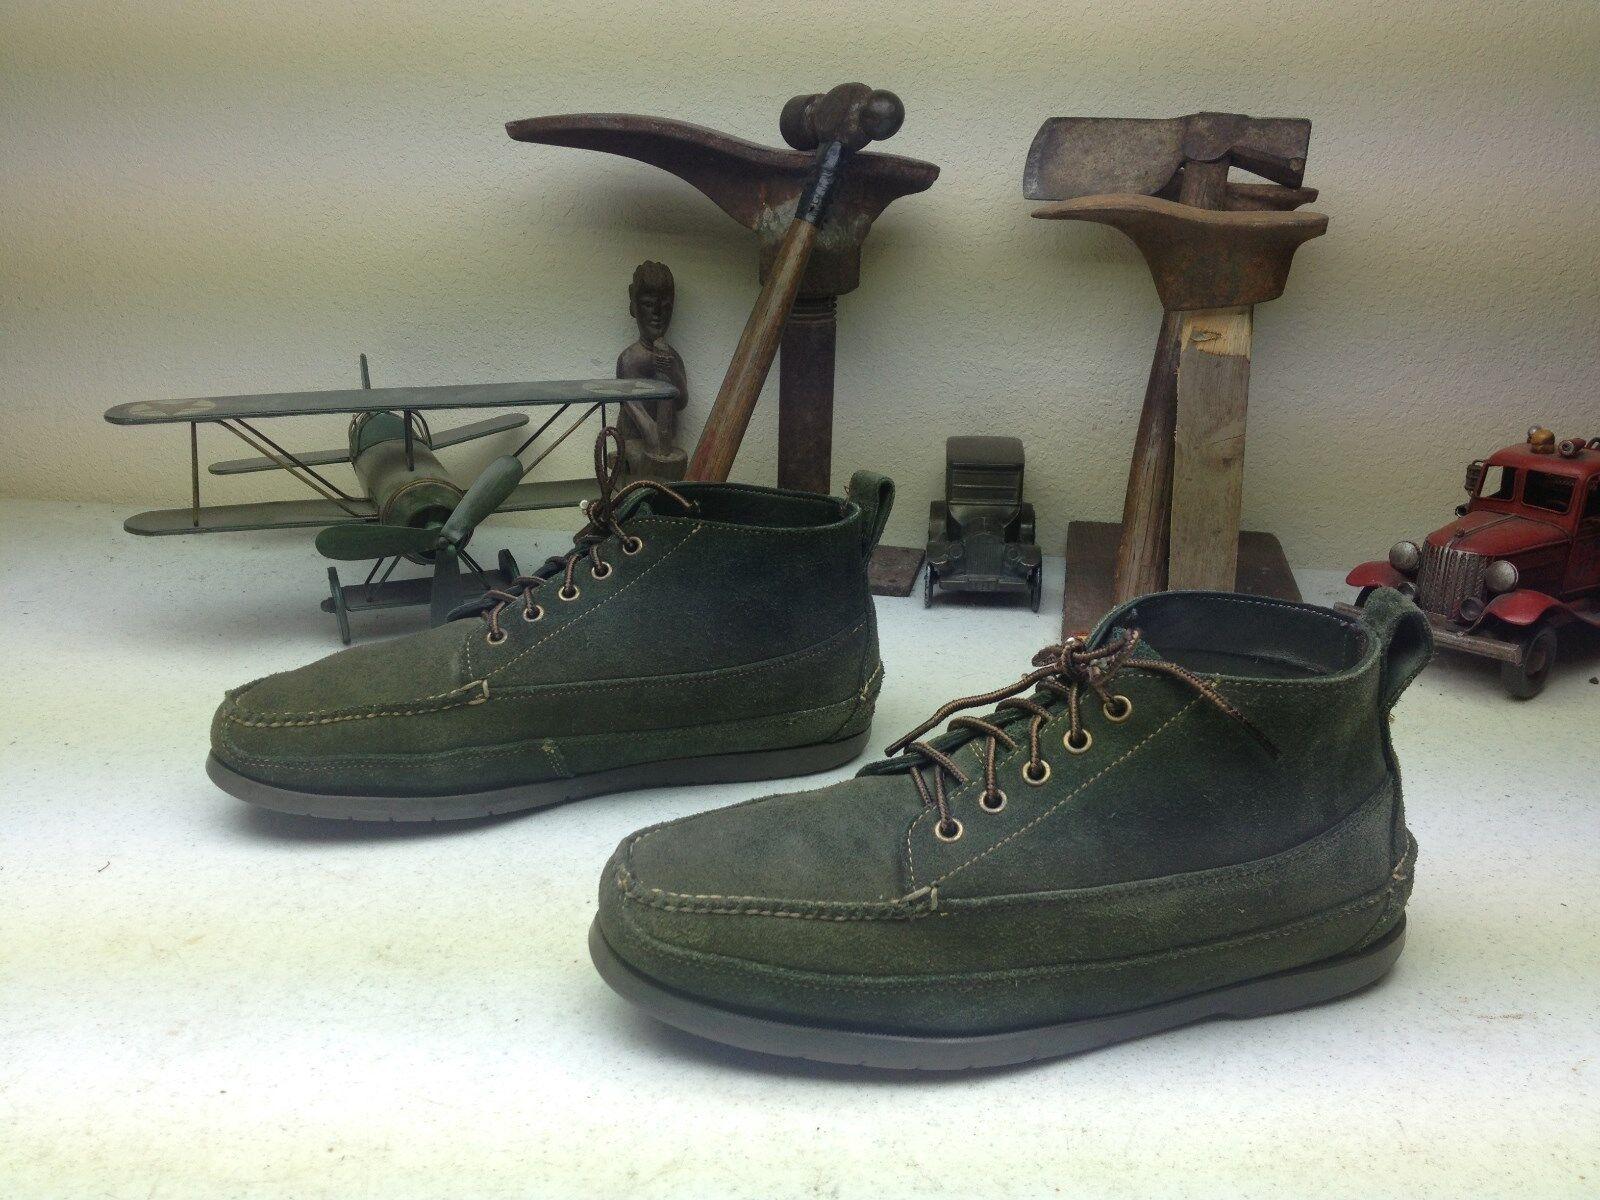 VINTAGE L.L. BEAN verde LEATHER LACE UP TRAIL HIKE PACKER CHUKKA stivali 10.5 D